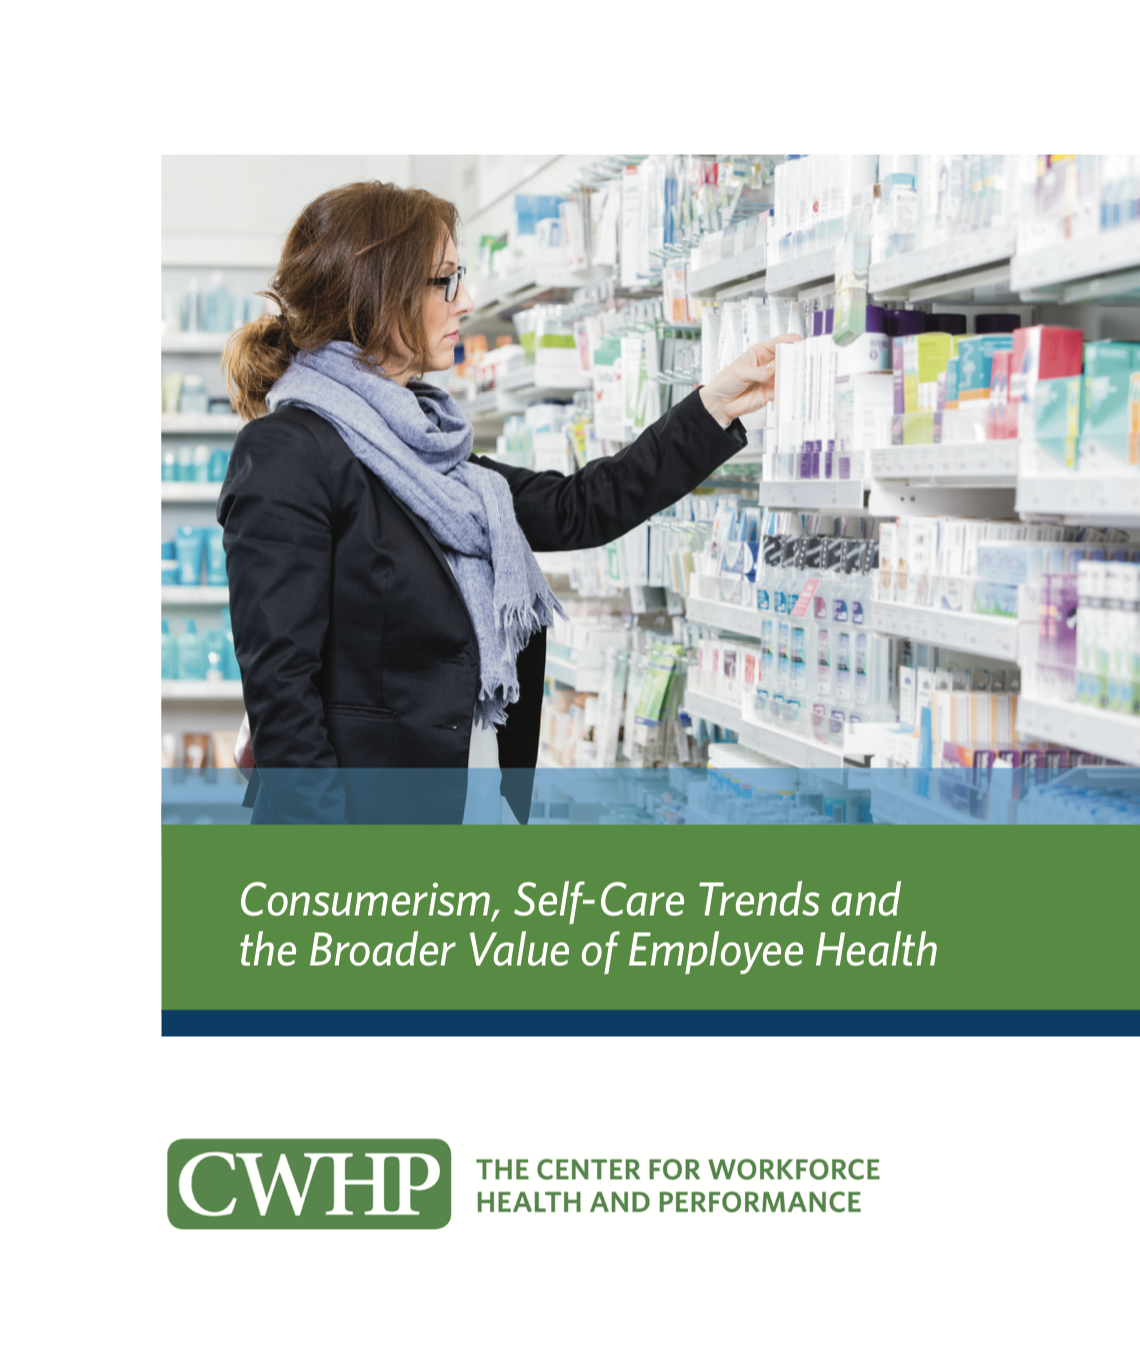 Consumerism and Health Value Report Image